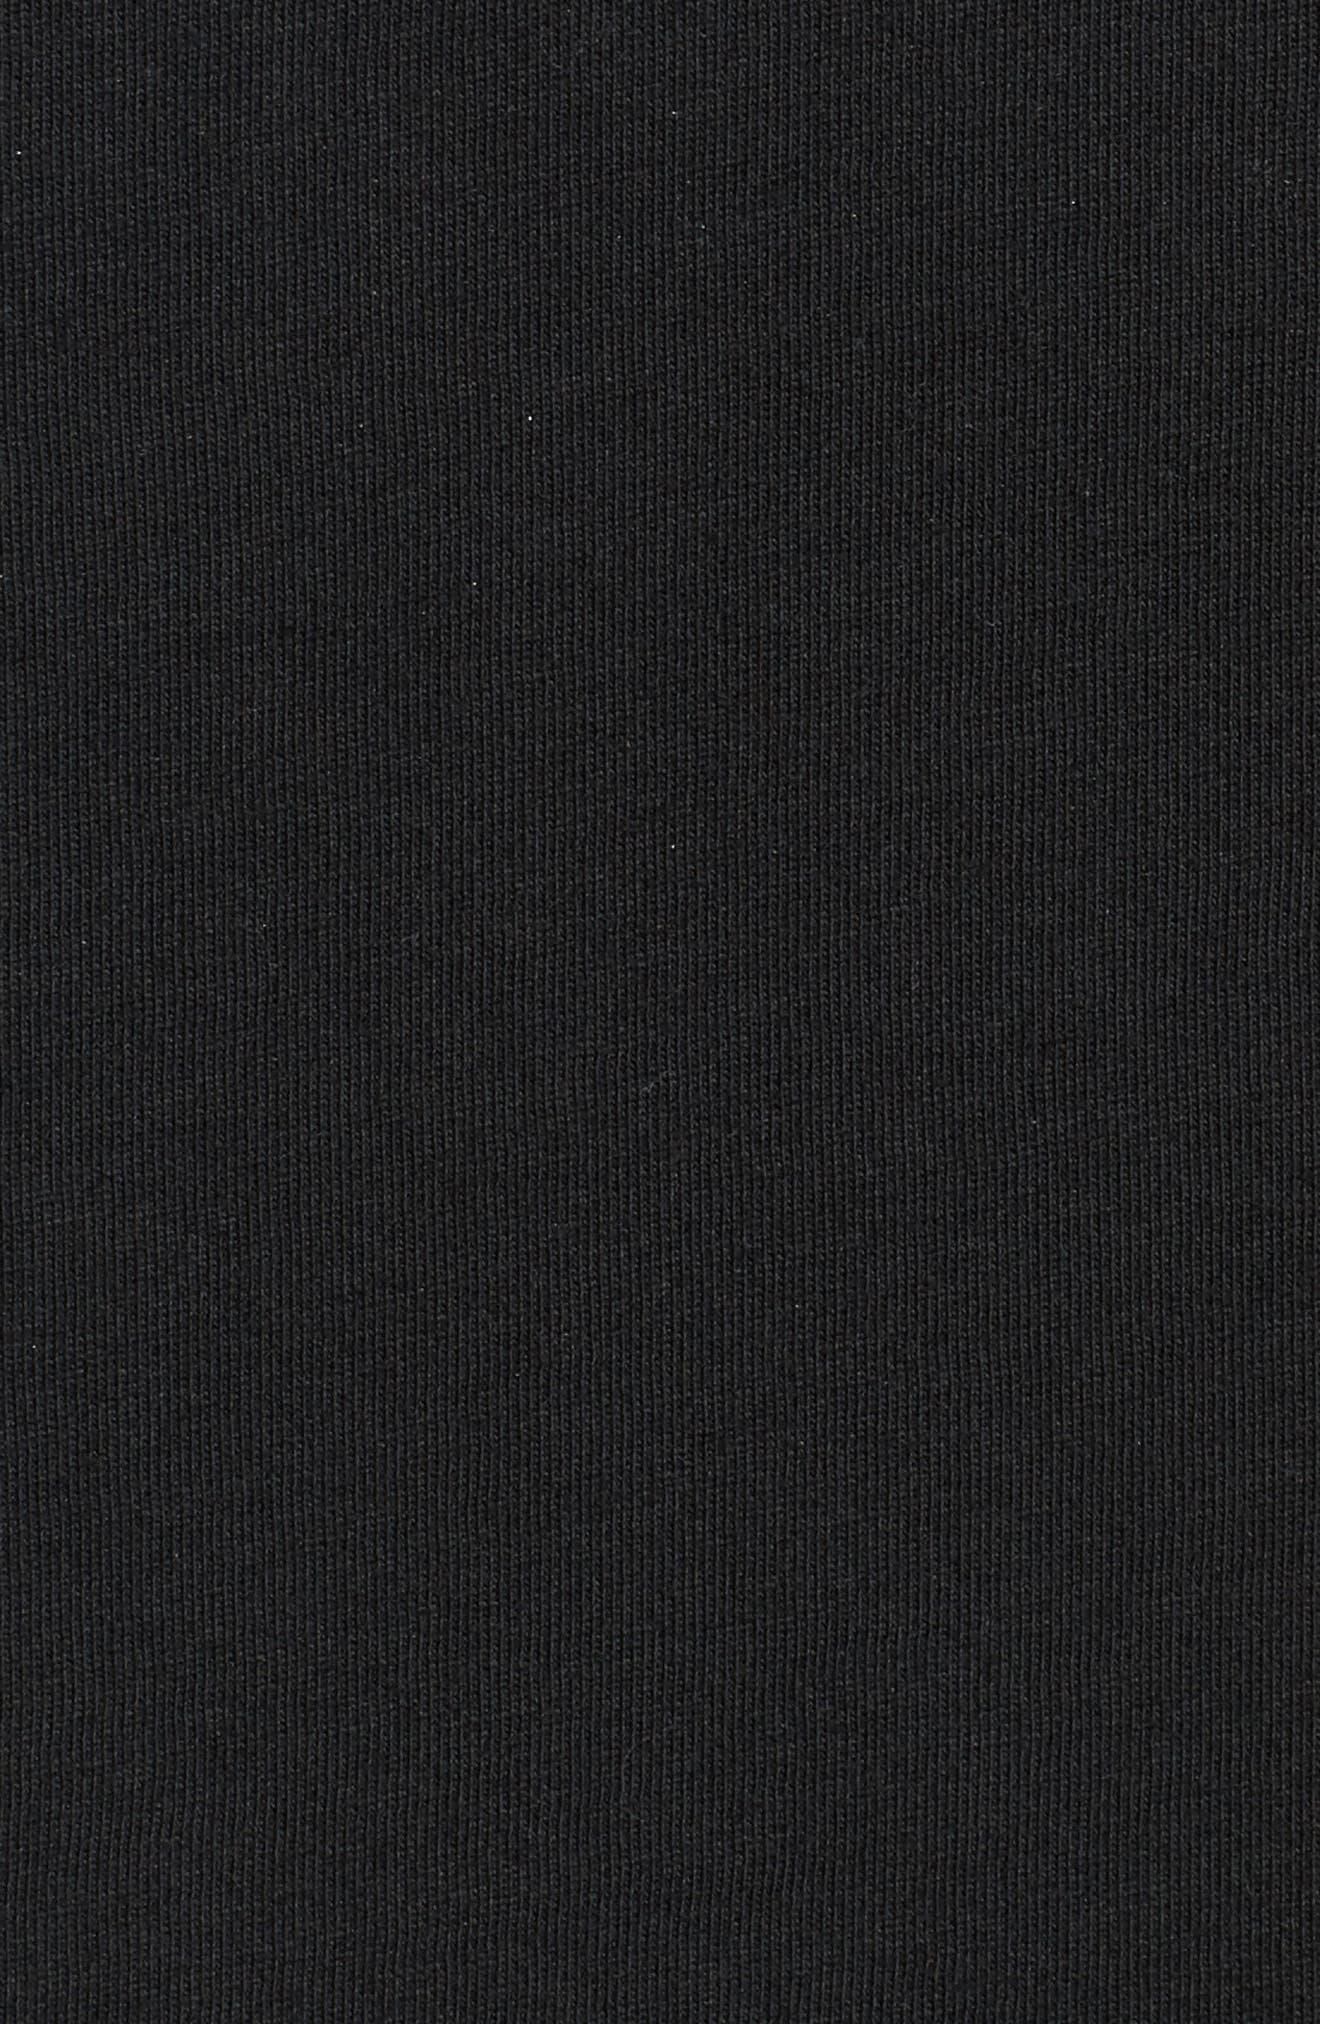 Wide Awake Graphic T-Shirt,                             Alternate thumbnail 5, color,                             Dusty Black